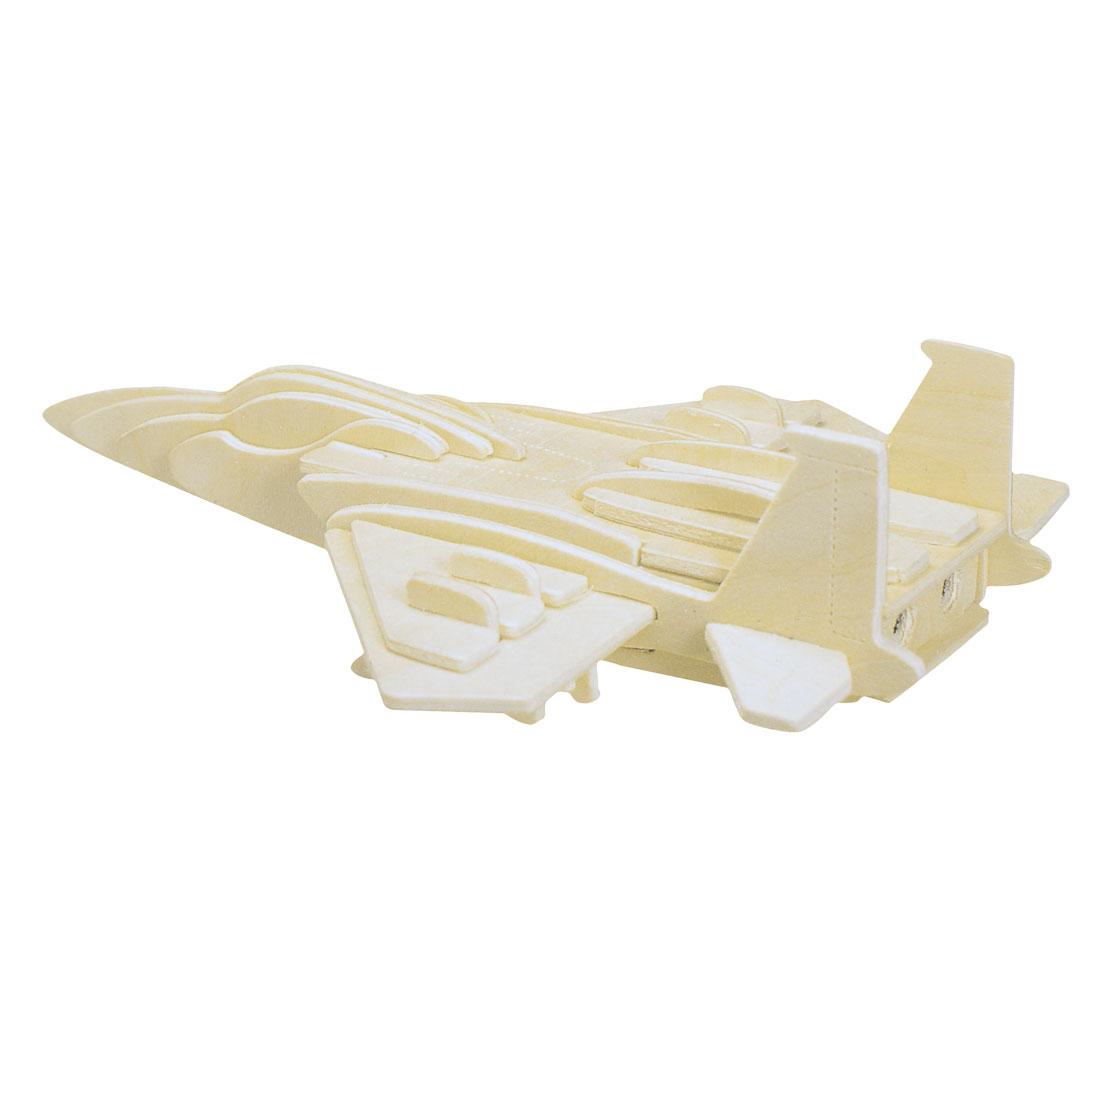 Children DIY 3D Puzzle F-15 Fighter Plane Model Wooden Toy Woodcraft Construction Kit